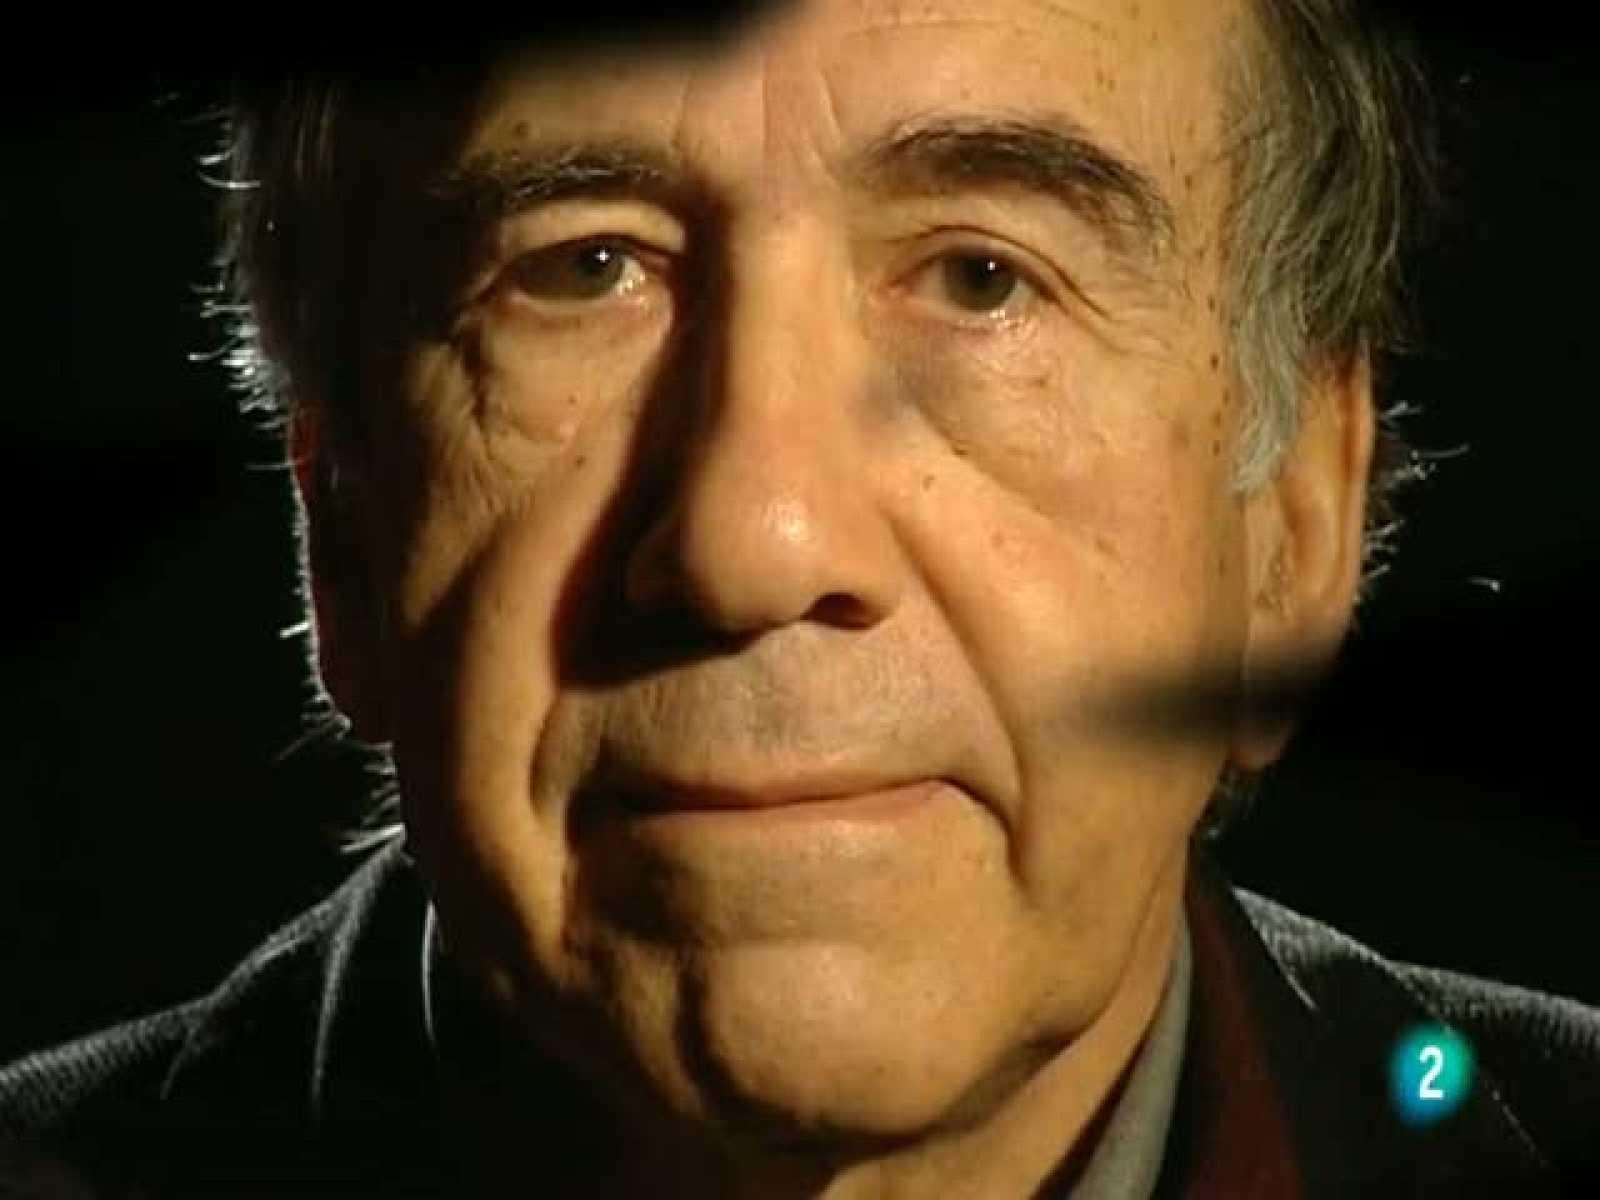 Gent de paraula (28/10/2010): Joan Margarit